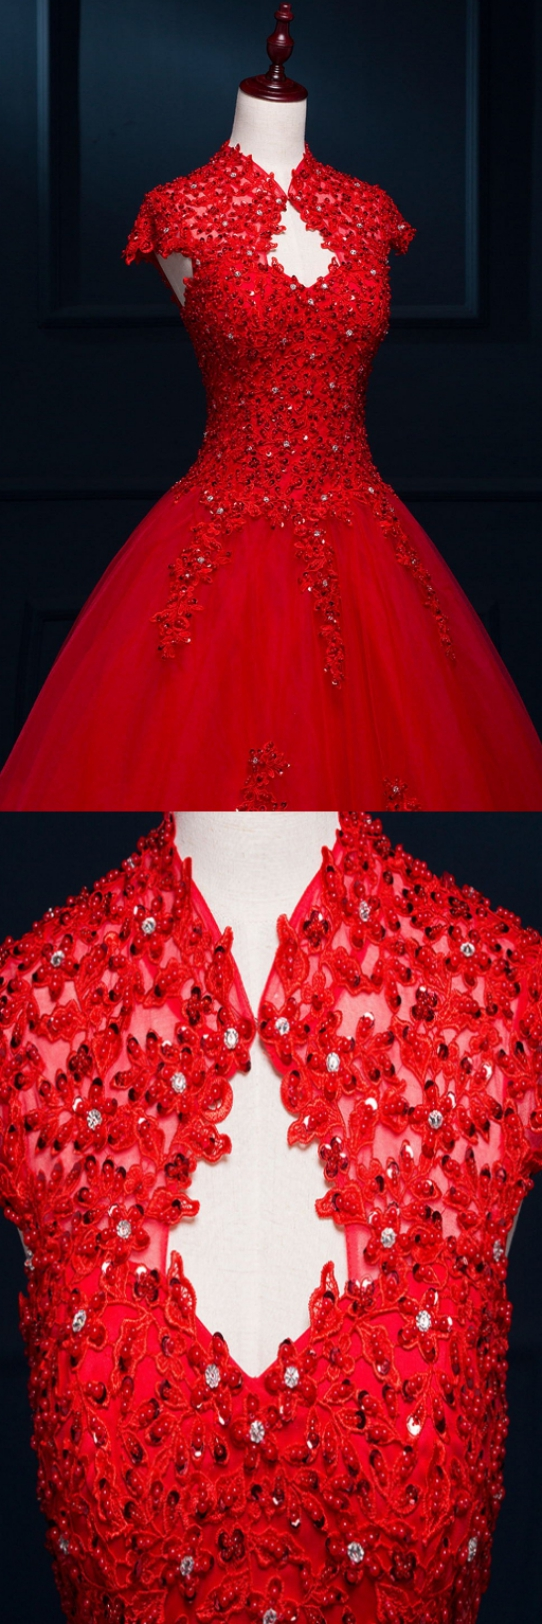 Hot sale vogue long alineprincess wedding dresses red cap sleeve